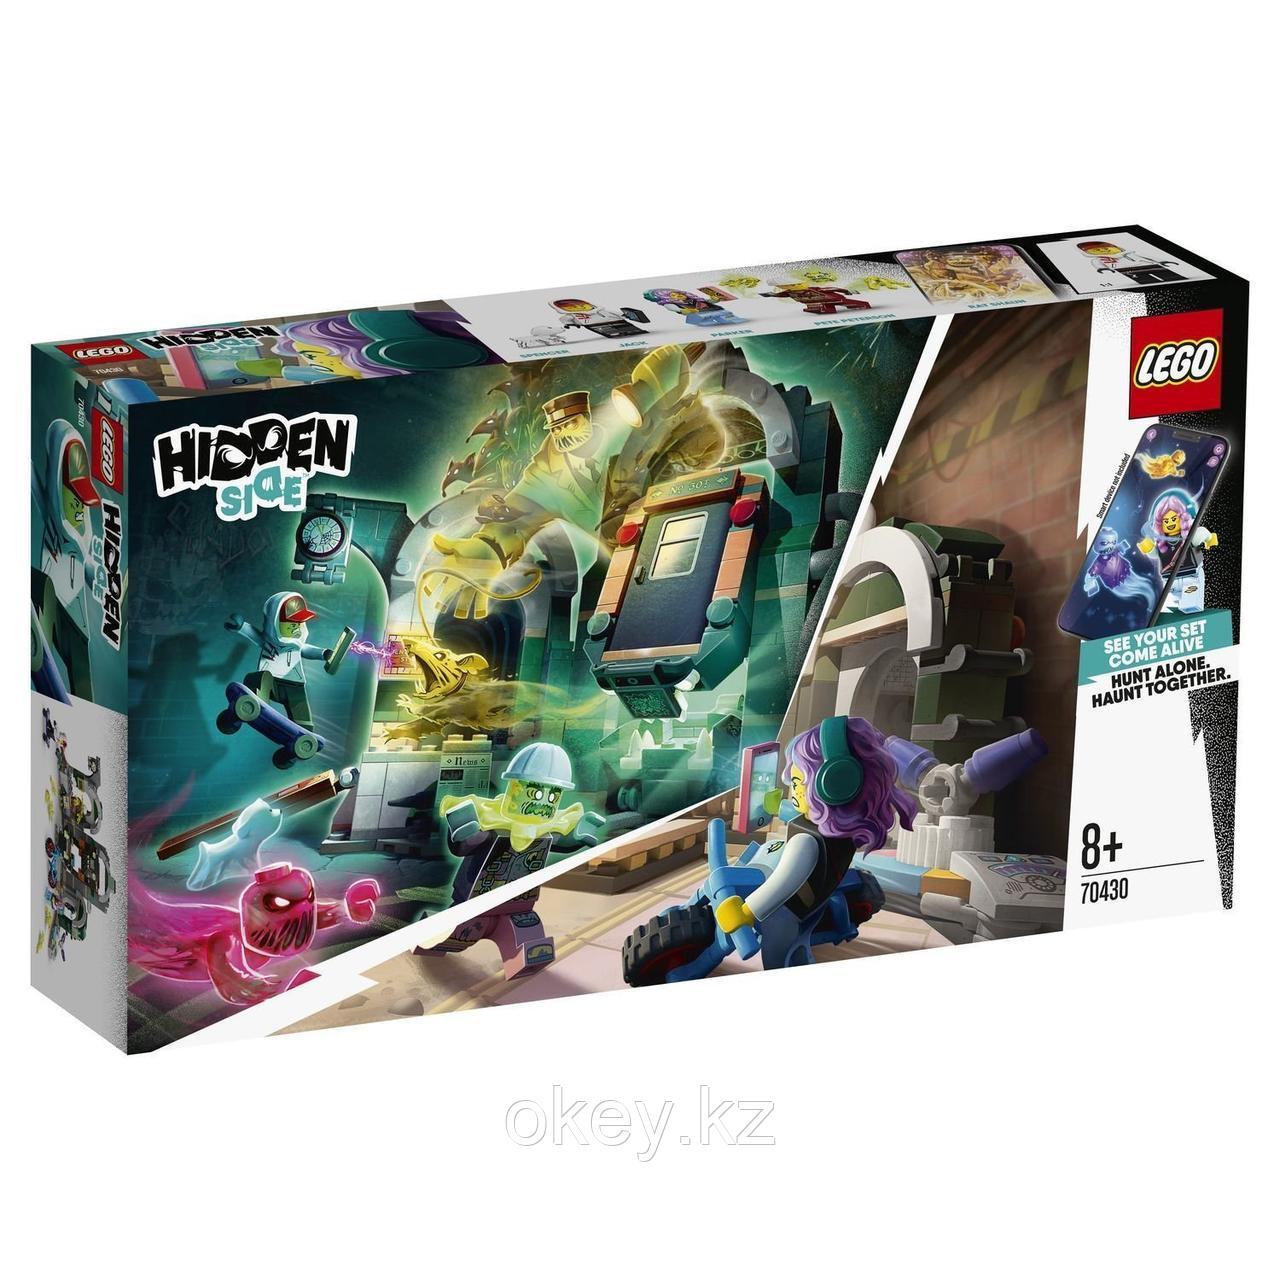 LEGO Hidden Side: Метро Ньюбери 70430